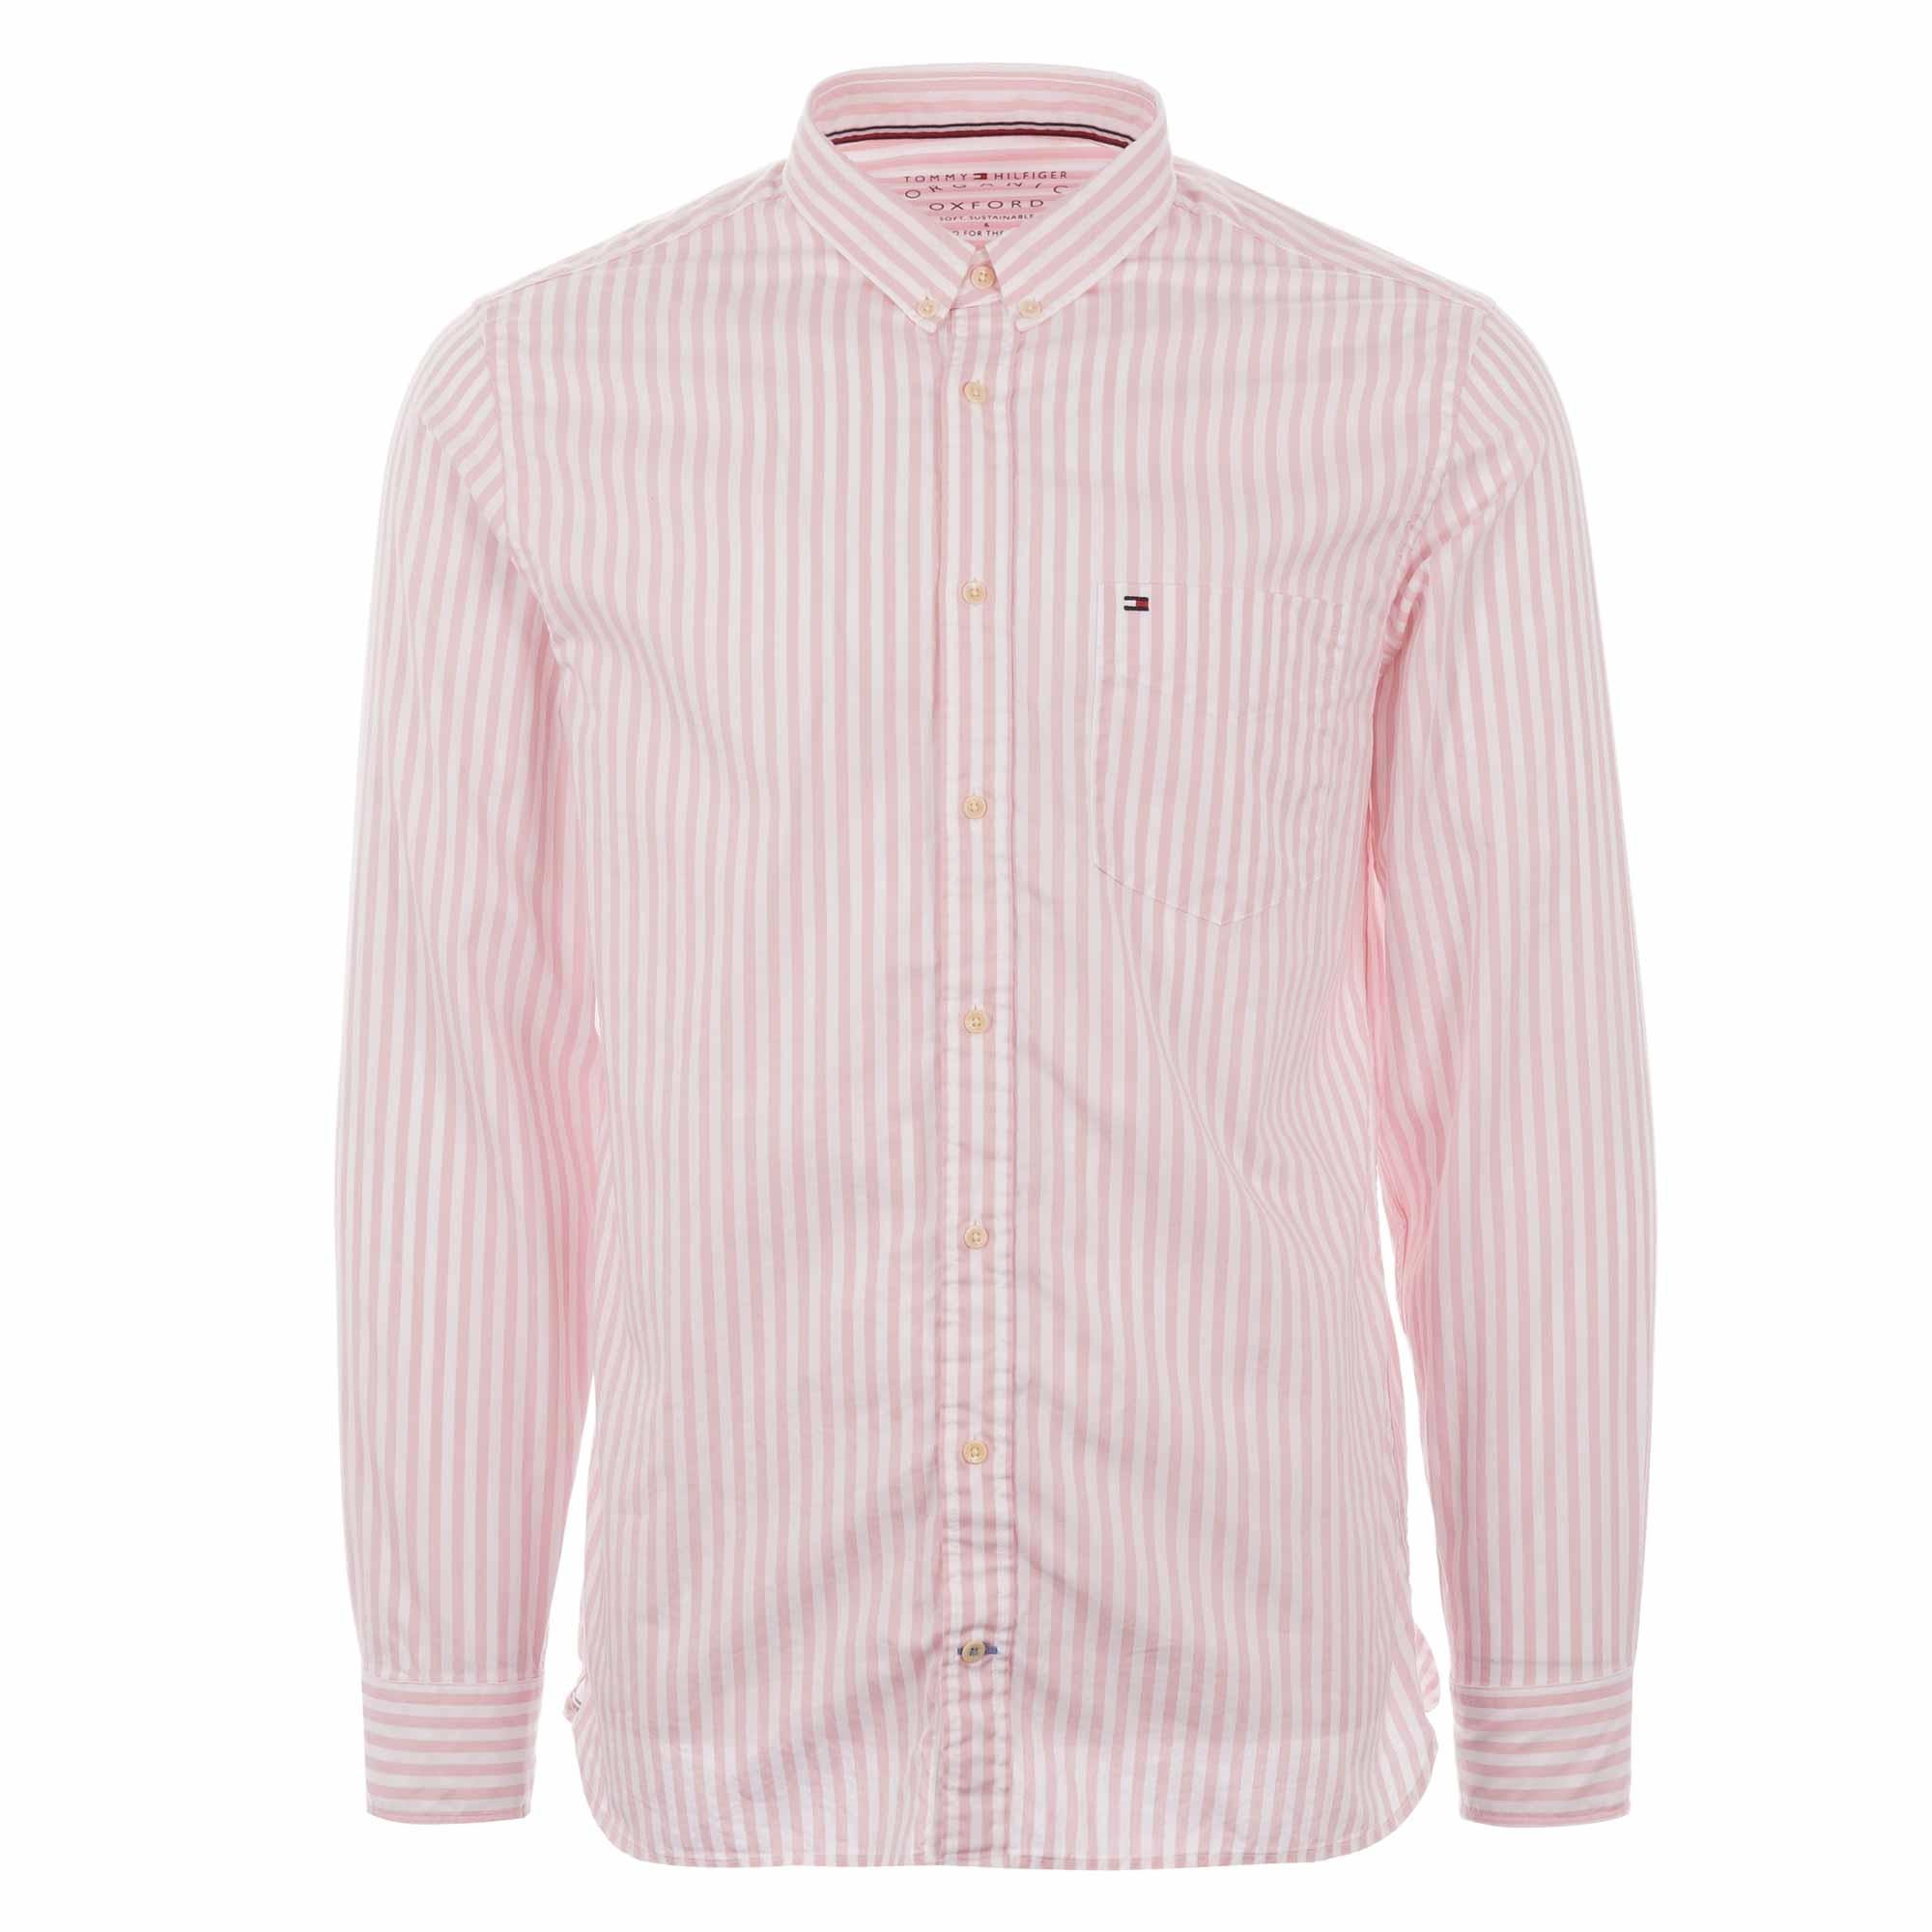 Striped Oxford Shirt Coral